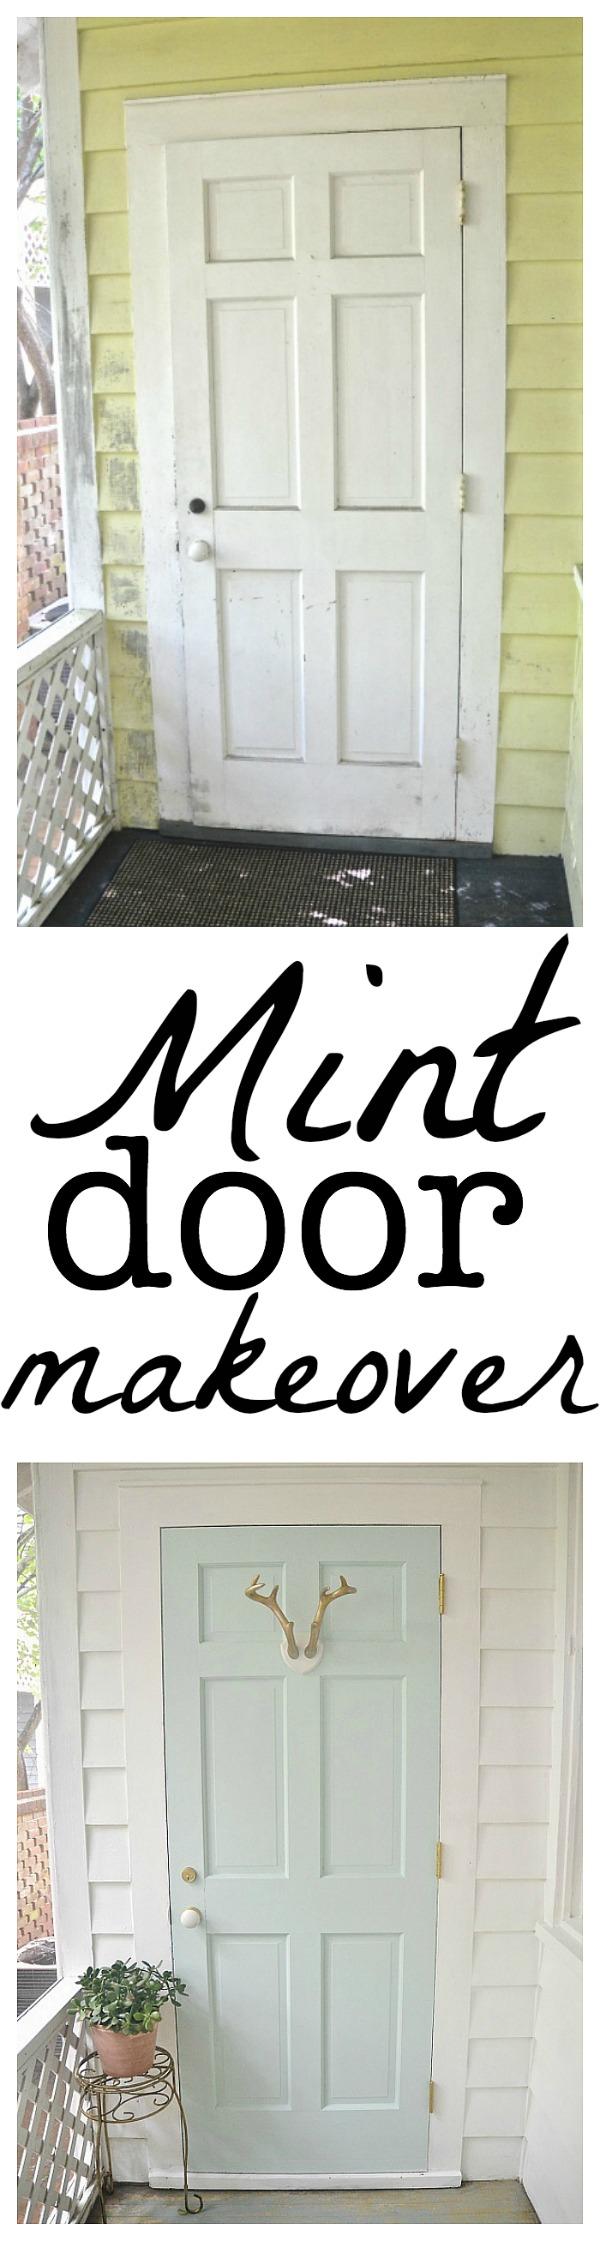 Mint door makeover - Behr Whipped Mint - lizmarieblog.com